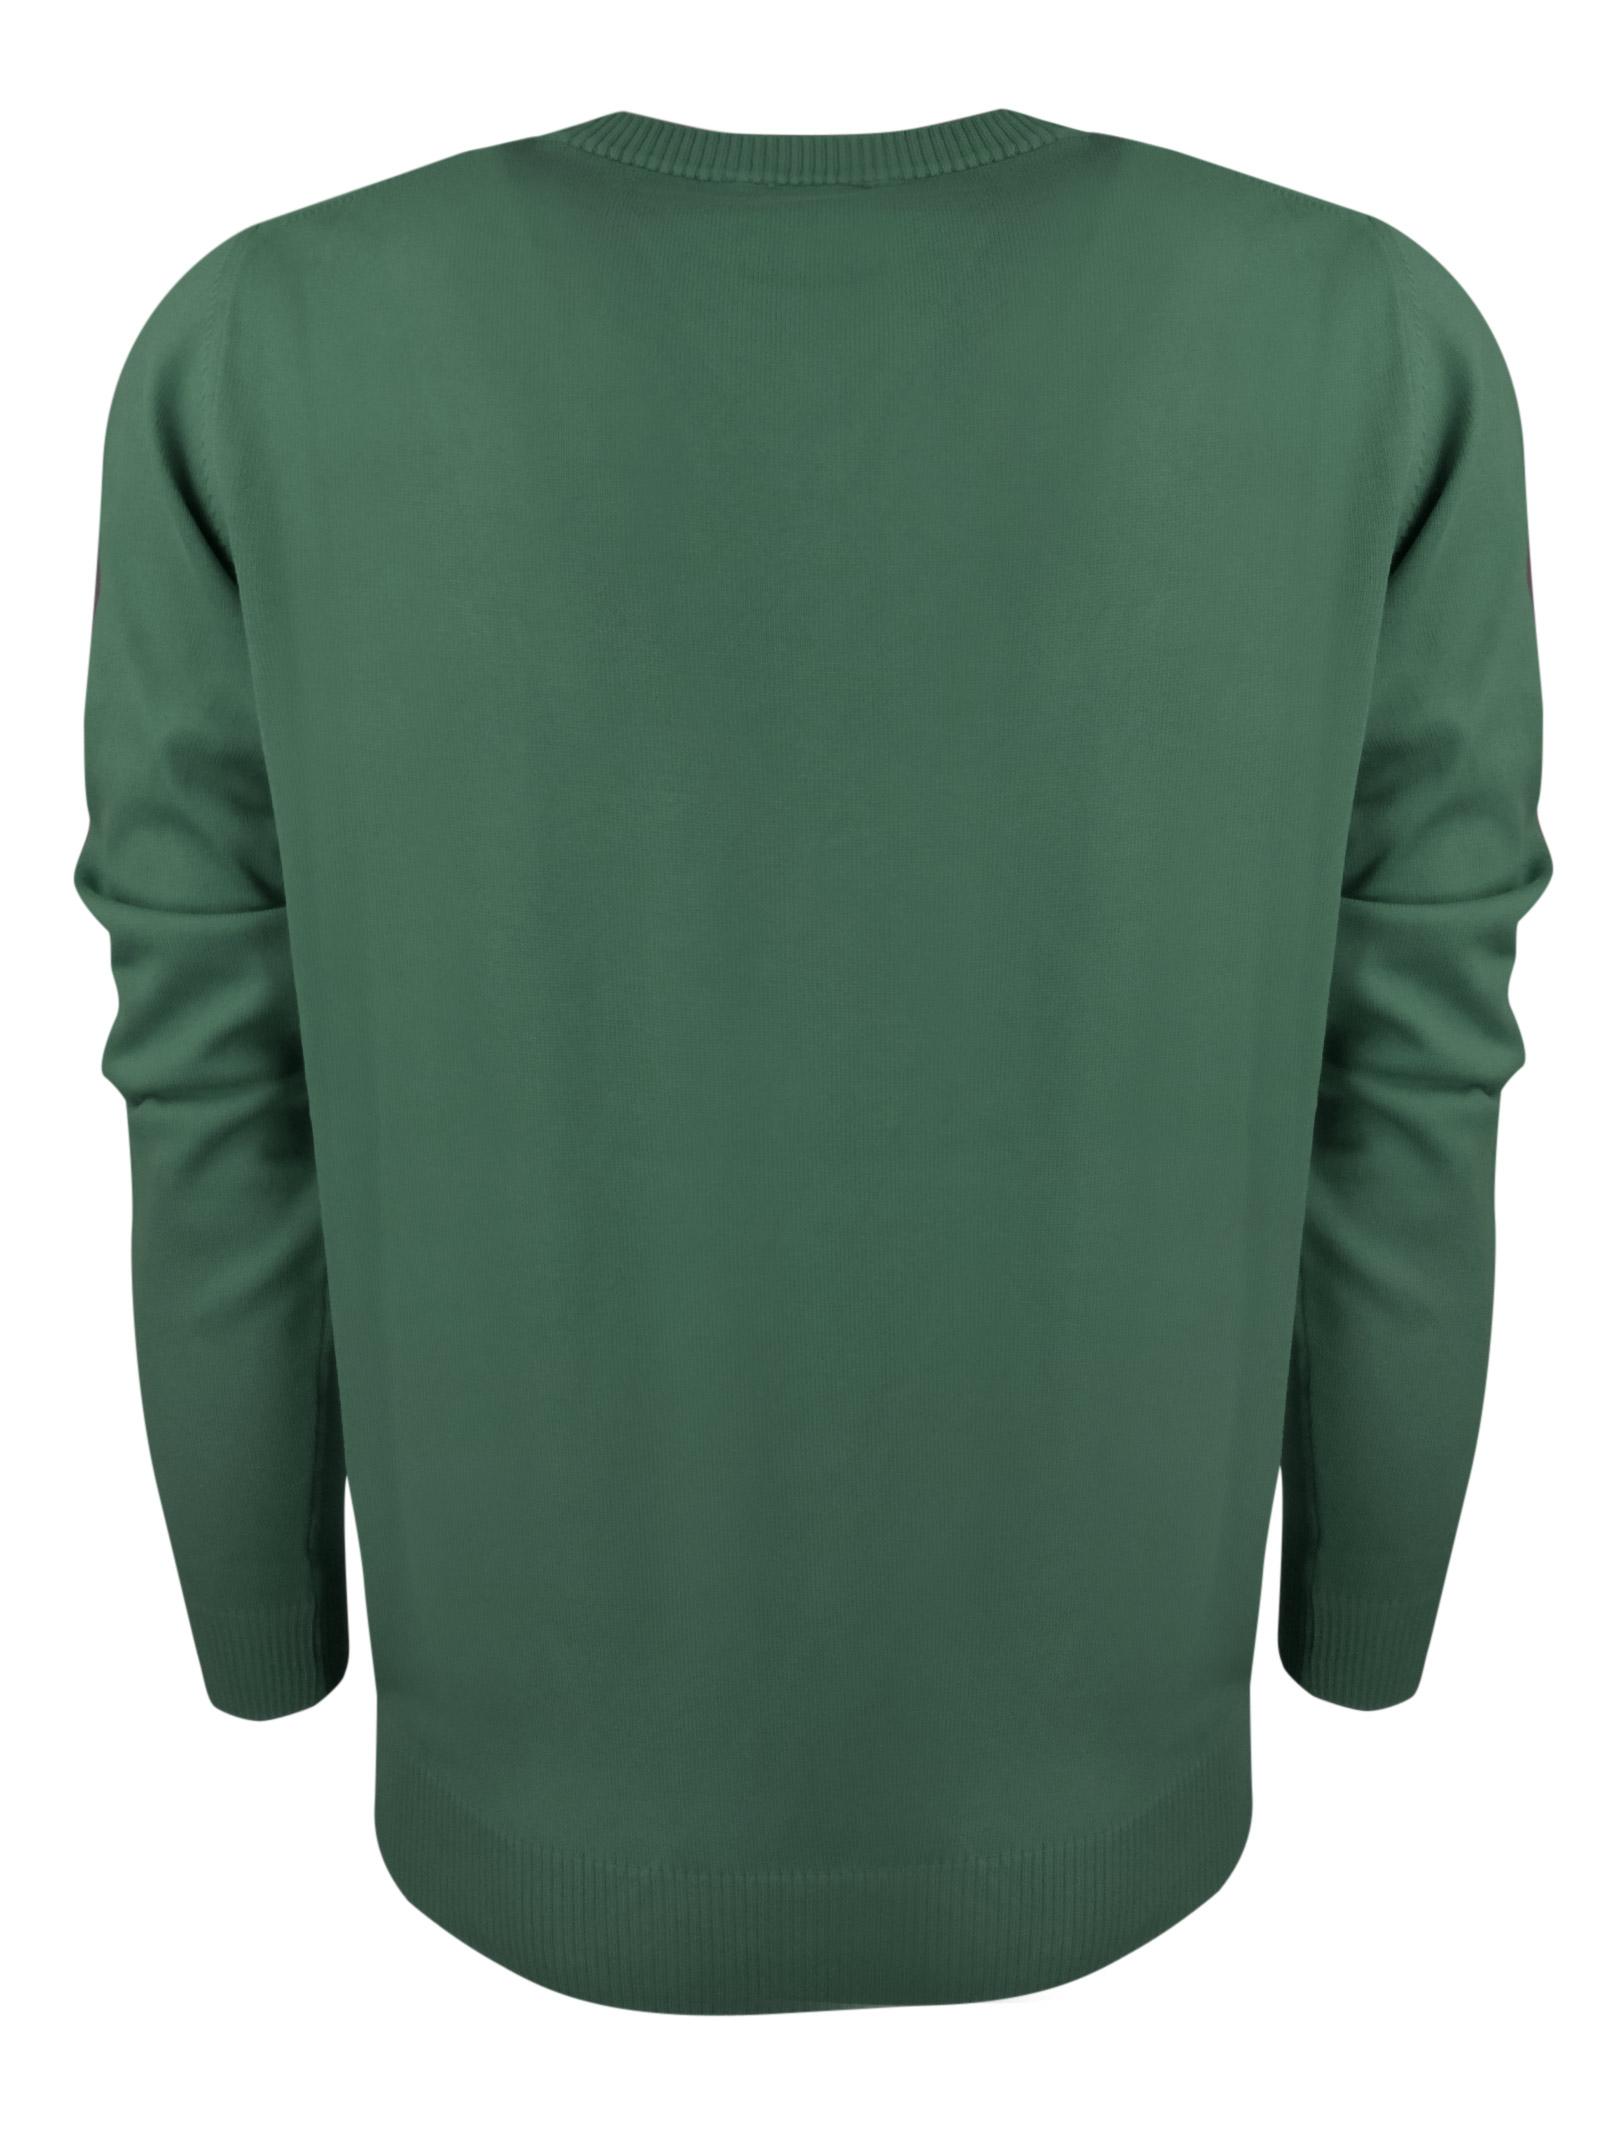 Crew neck cotton  sweater, contrast logo . BROOKSFIELD | Knitwear | 203E.A0217240